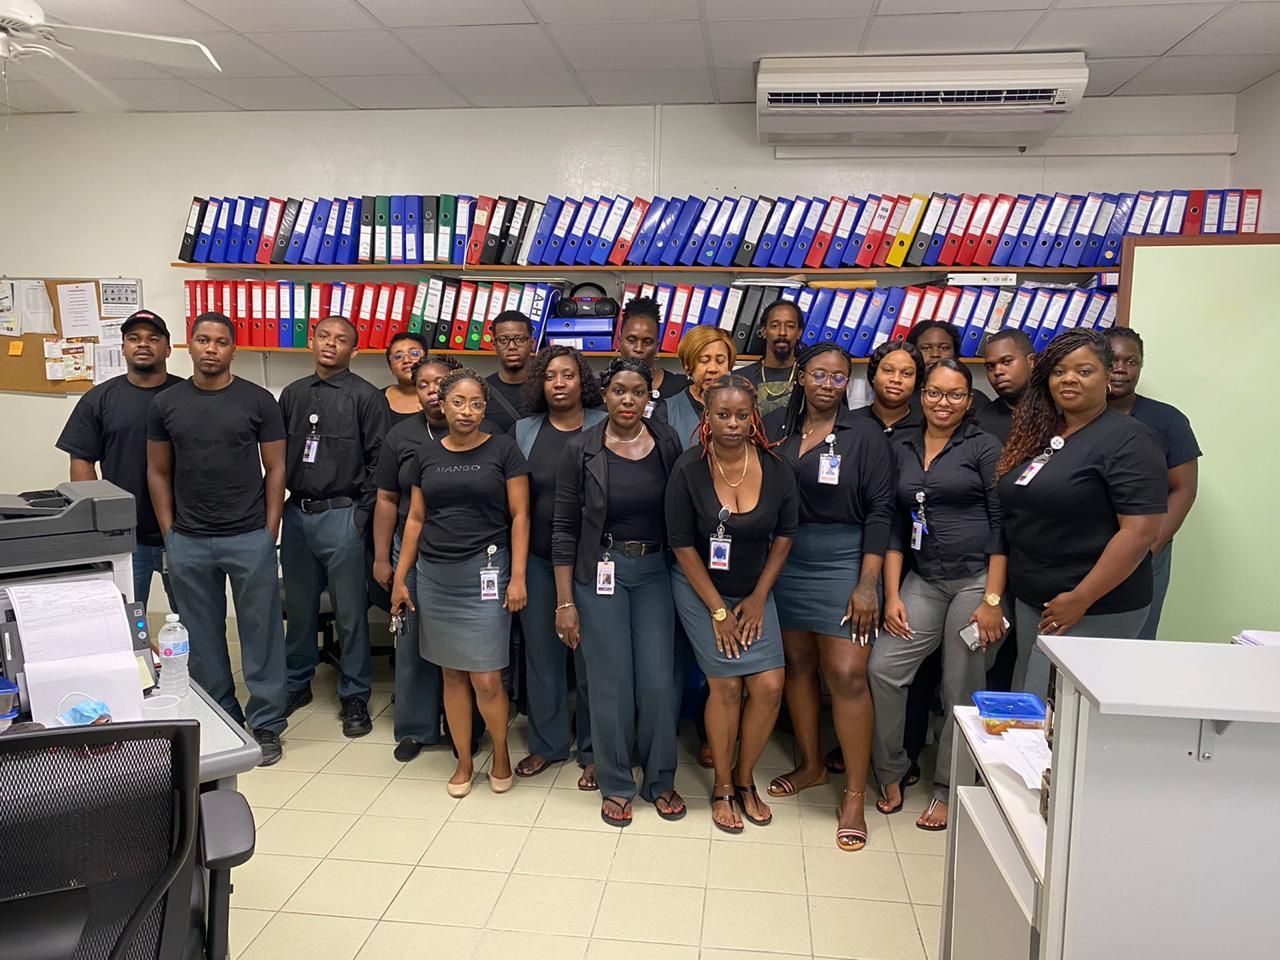 SMMC staff wearing black tops